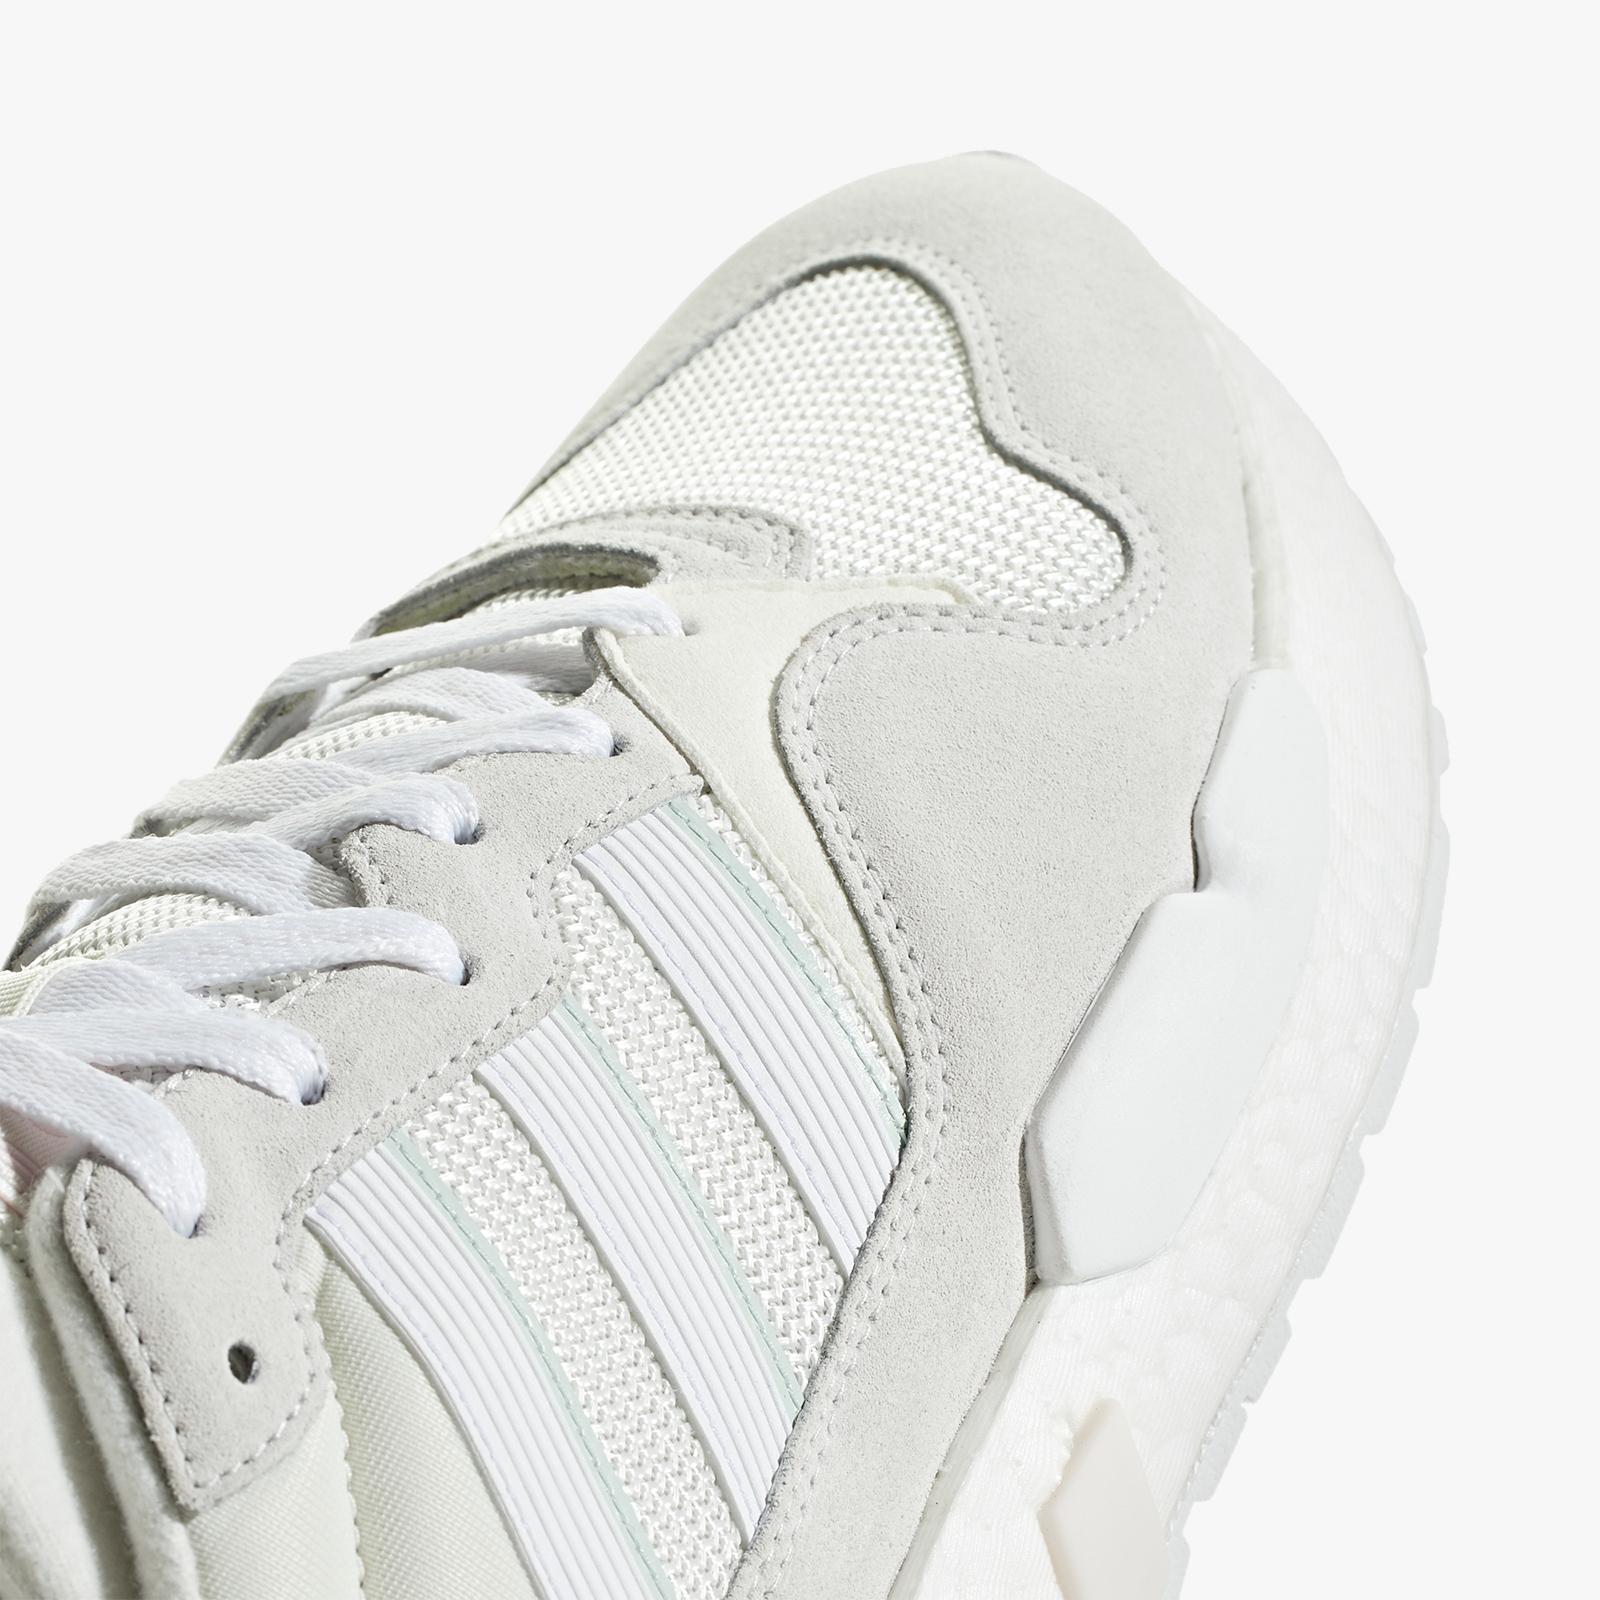 33e89493f adidas ZX930 x EQT - G27831 - Sneakersnstuff